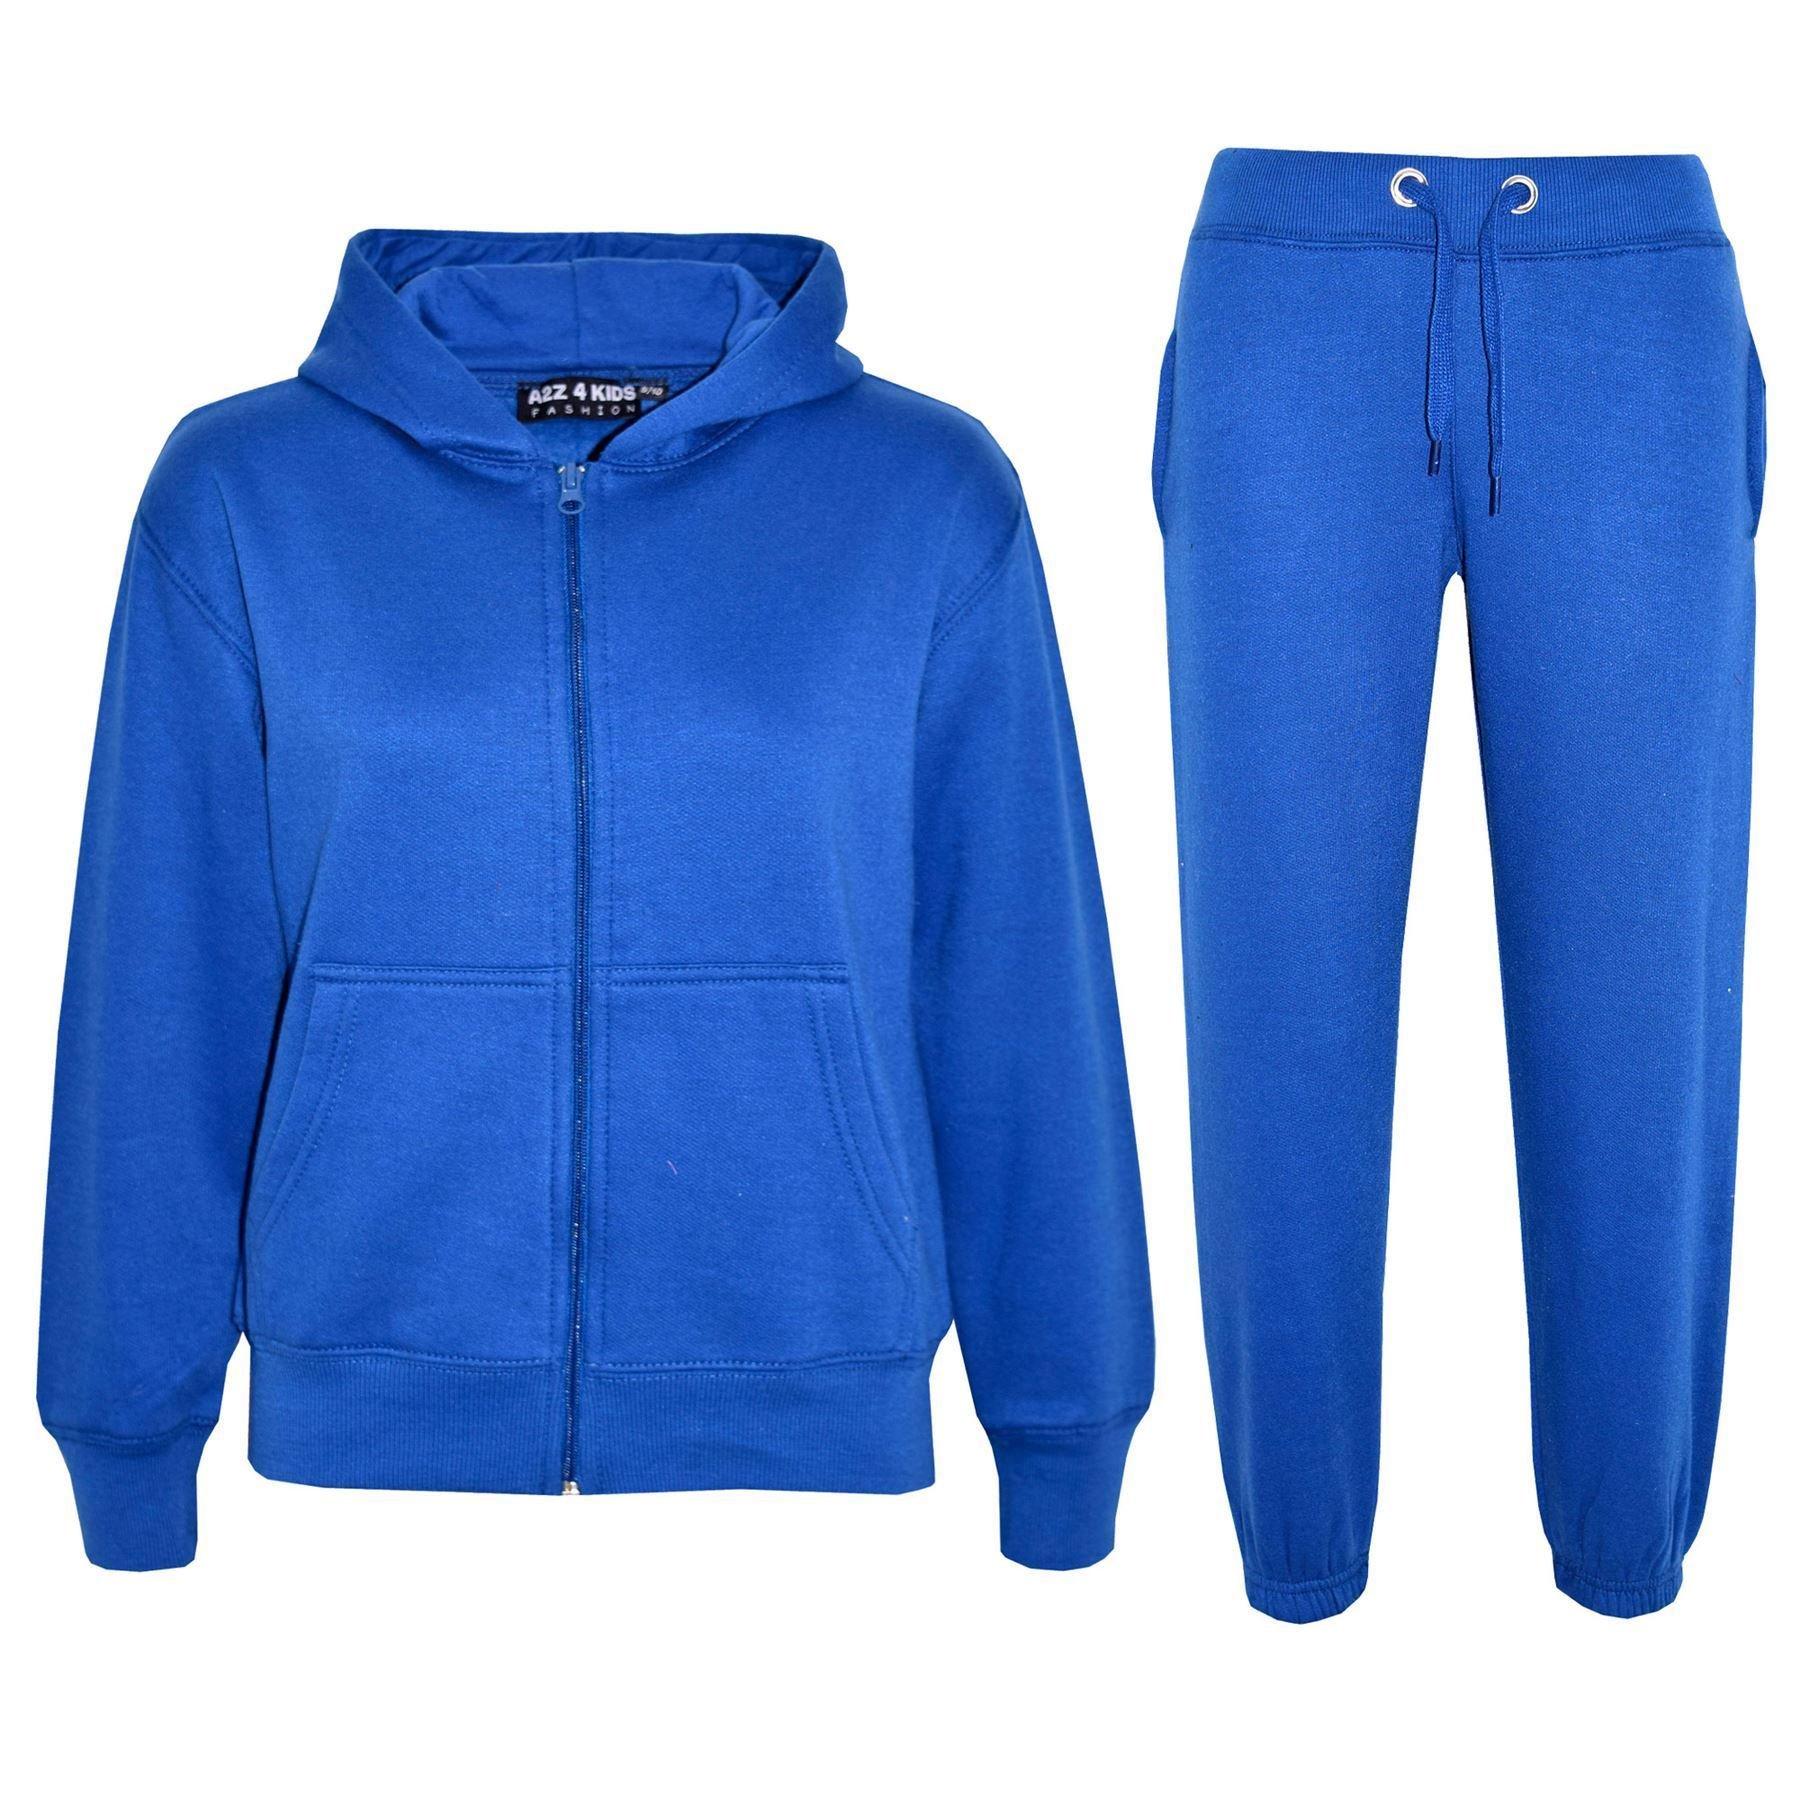 A2Z 4 Kids Girls Boys Plain Tracksuit Hooded Hoodie Bottom Jog Suit Joggers